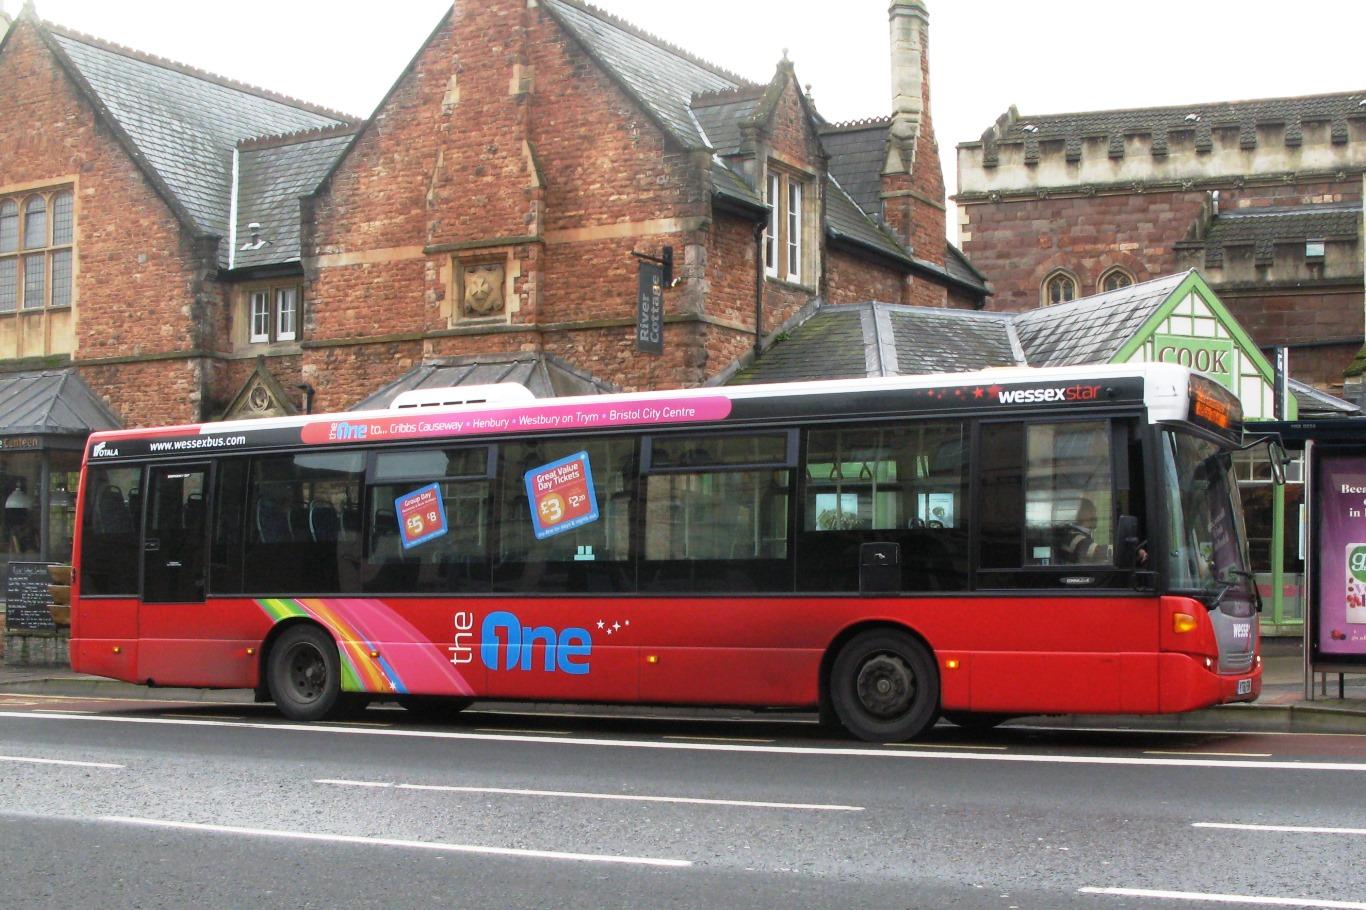 wessex 1 bus